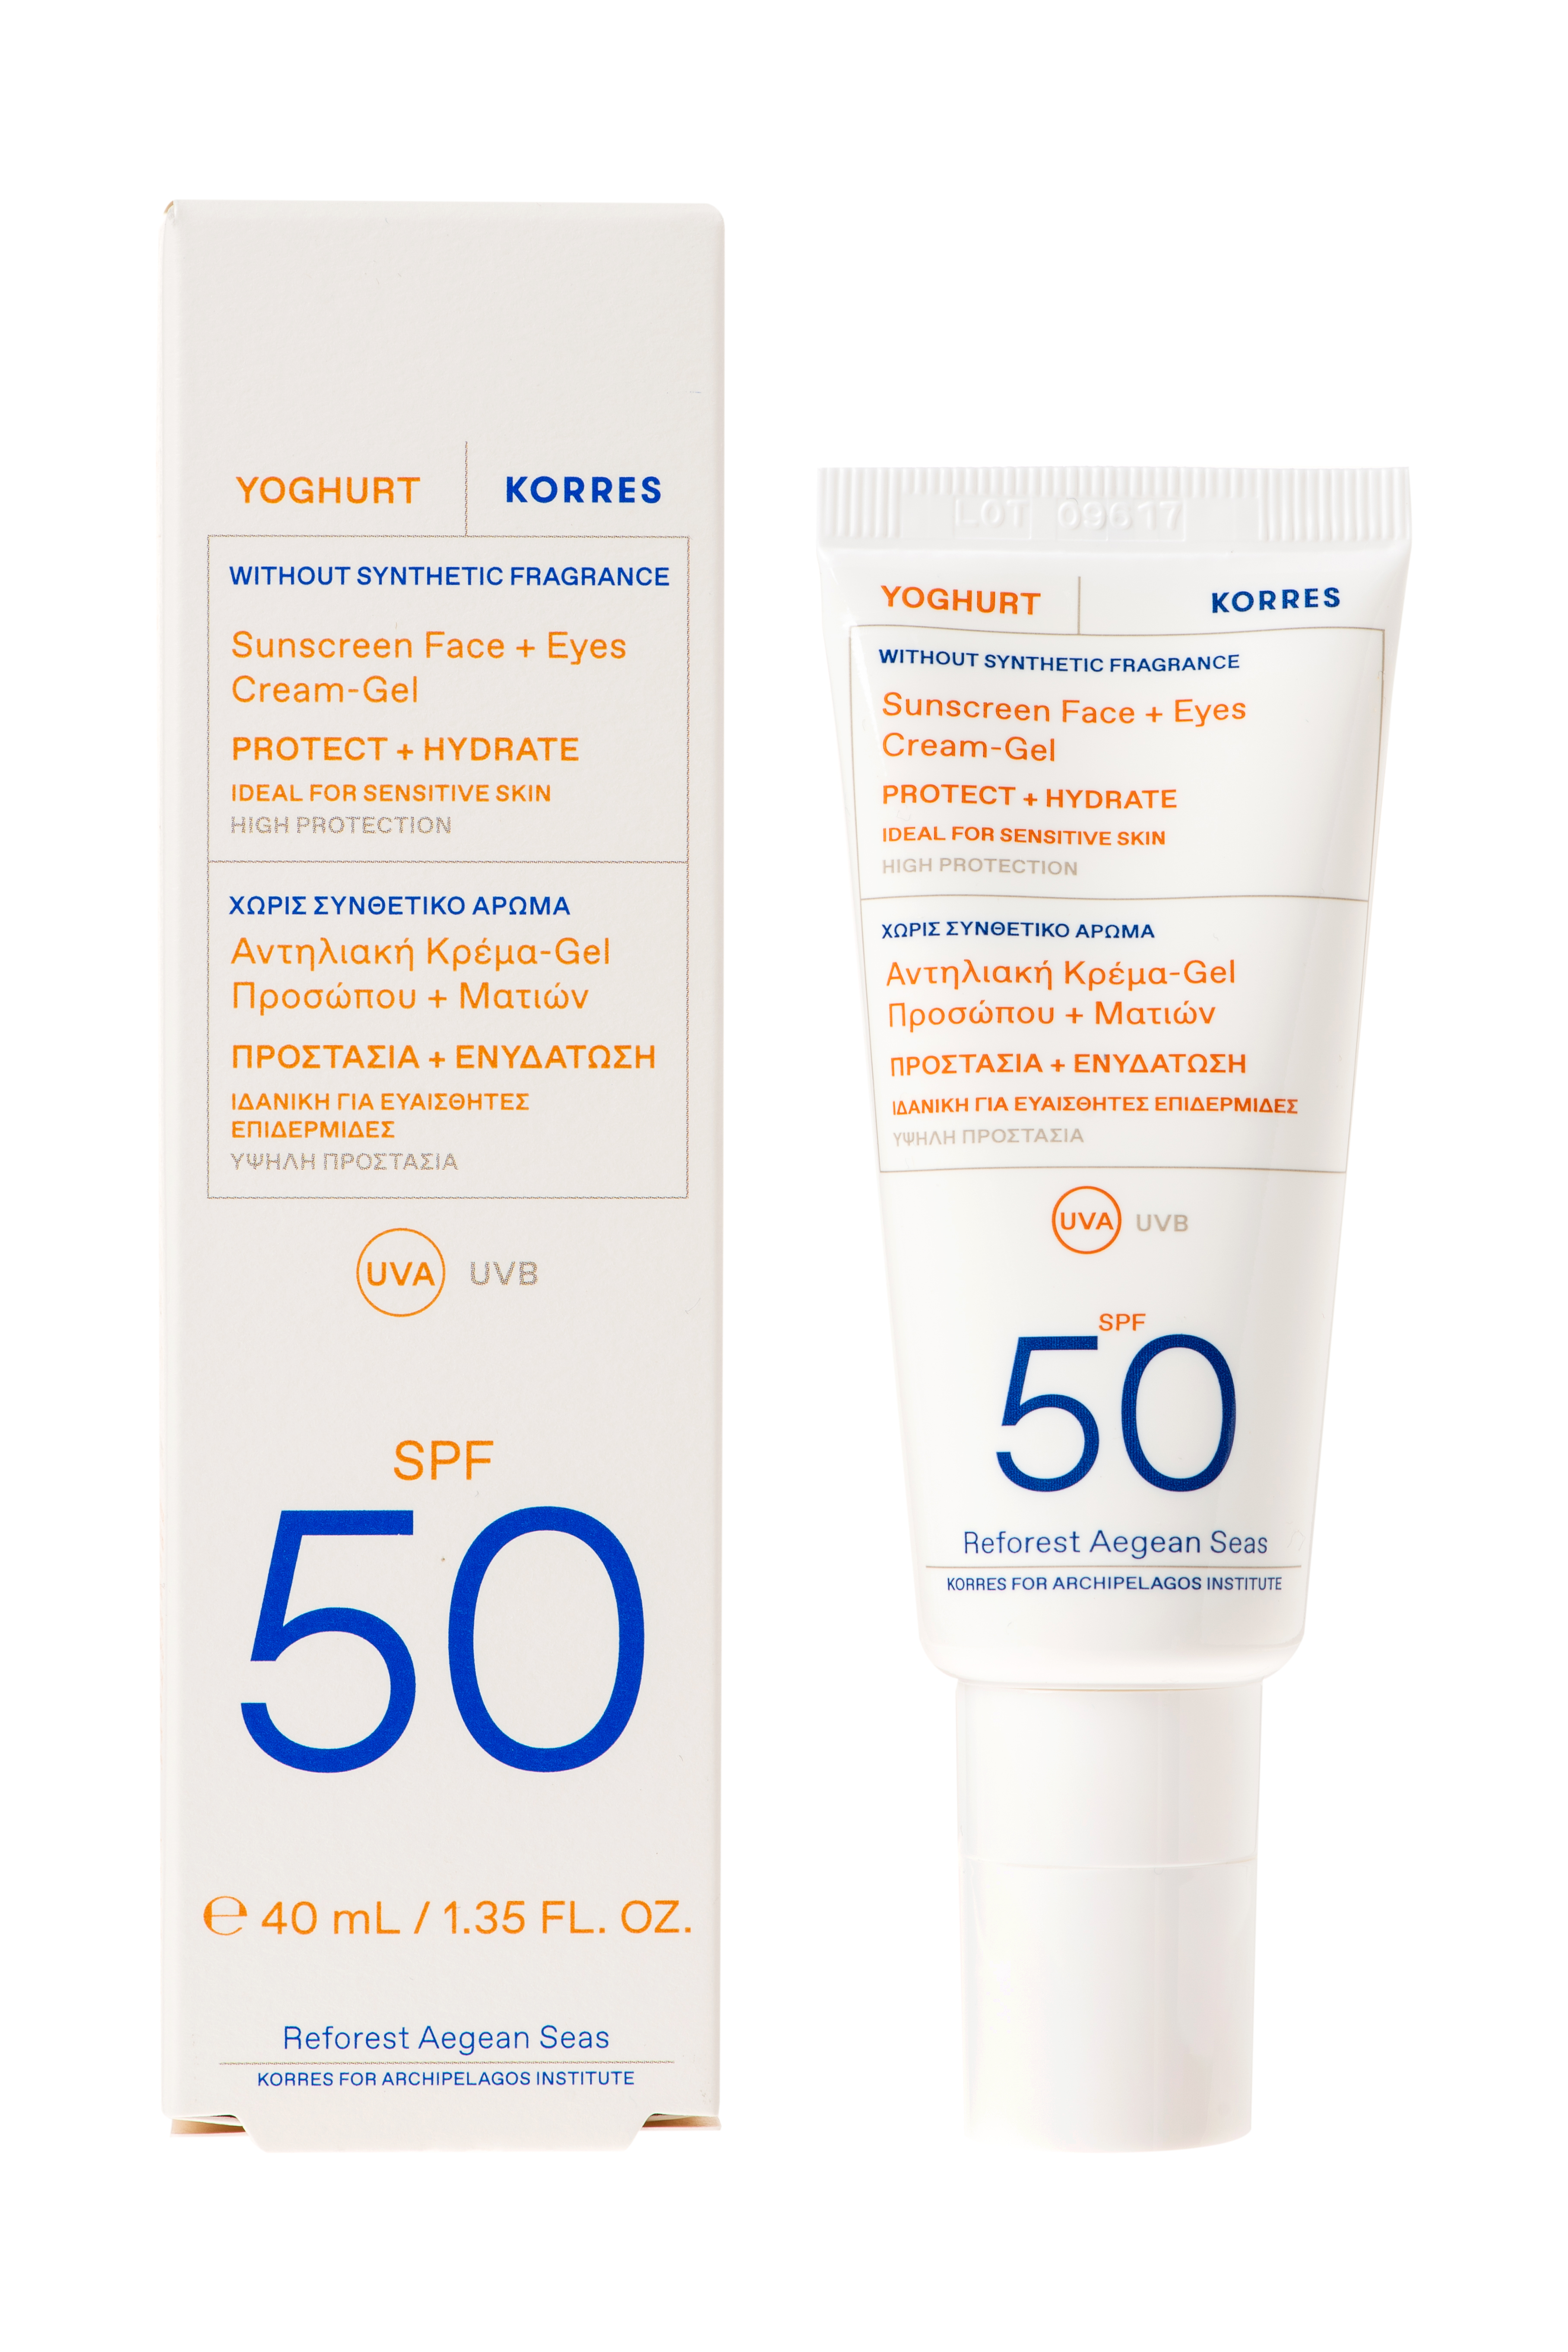 KORRES - Yoghurt Αντηλιακή Κρέμα-Gel Προσώπου & Ματιών SPF50 - 40ml